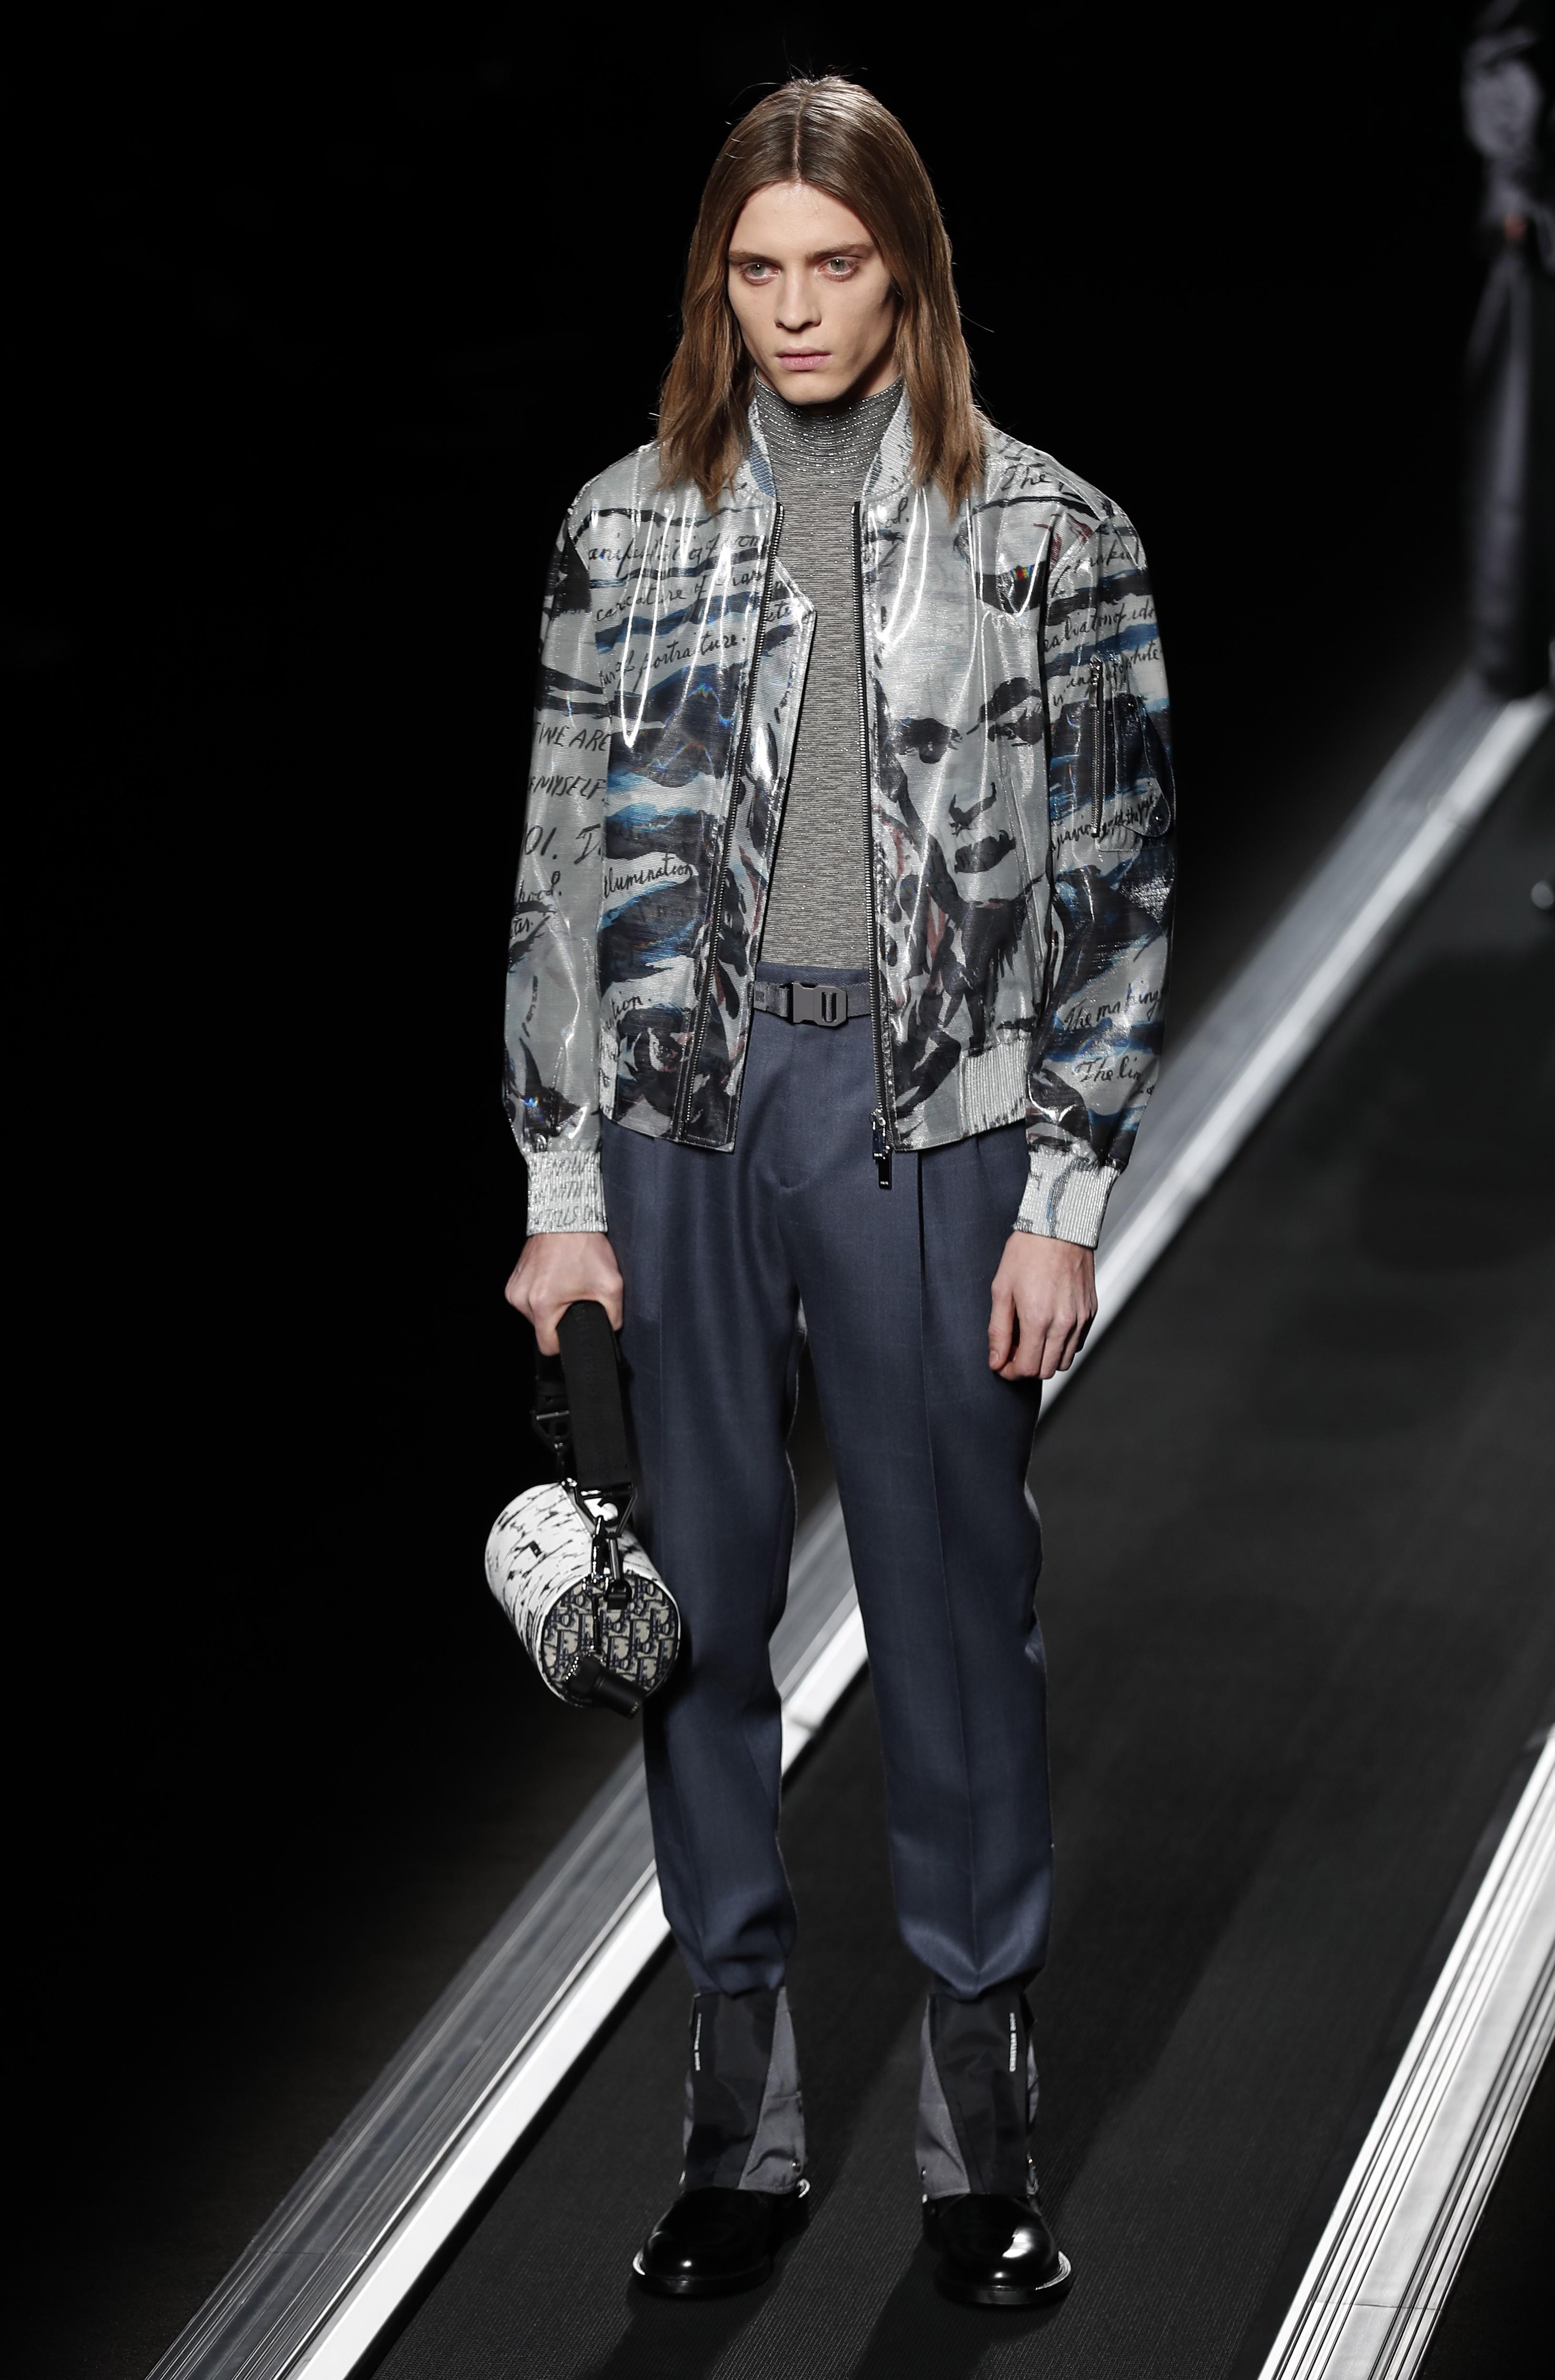 cdaef290418 Paris Fashion Week  Dior s statuesque models cut a dash as well-tailored  suits make a comeback